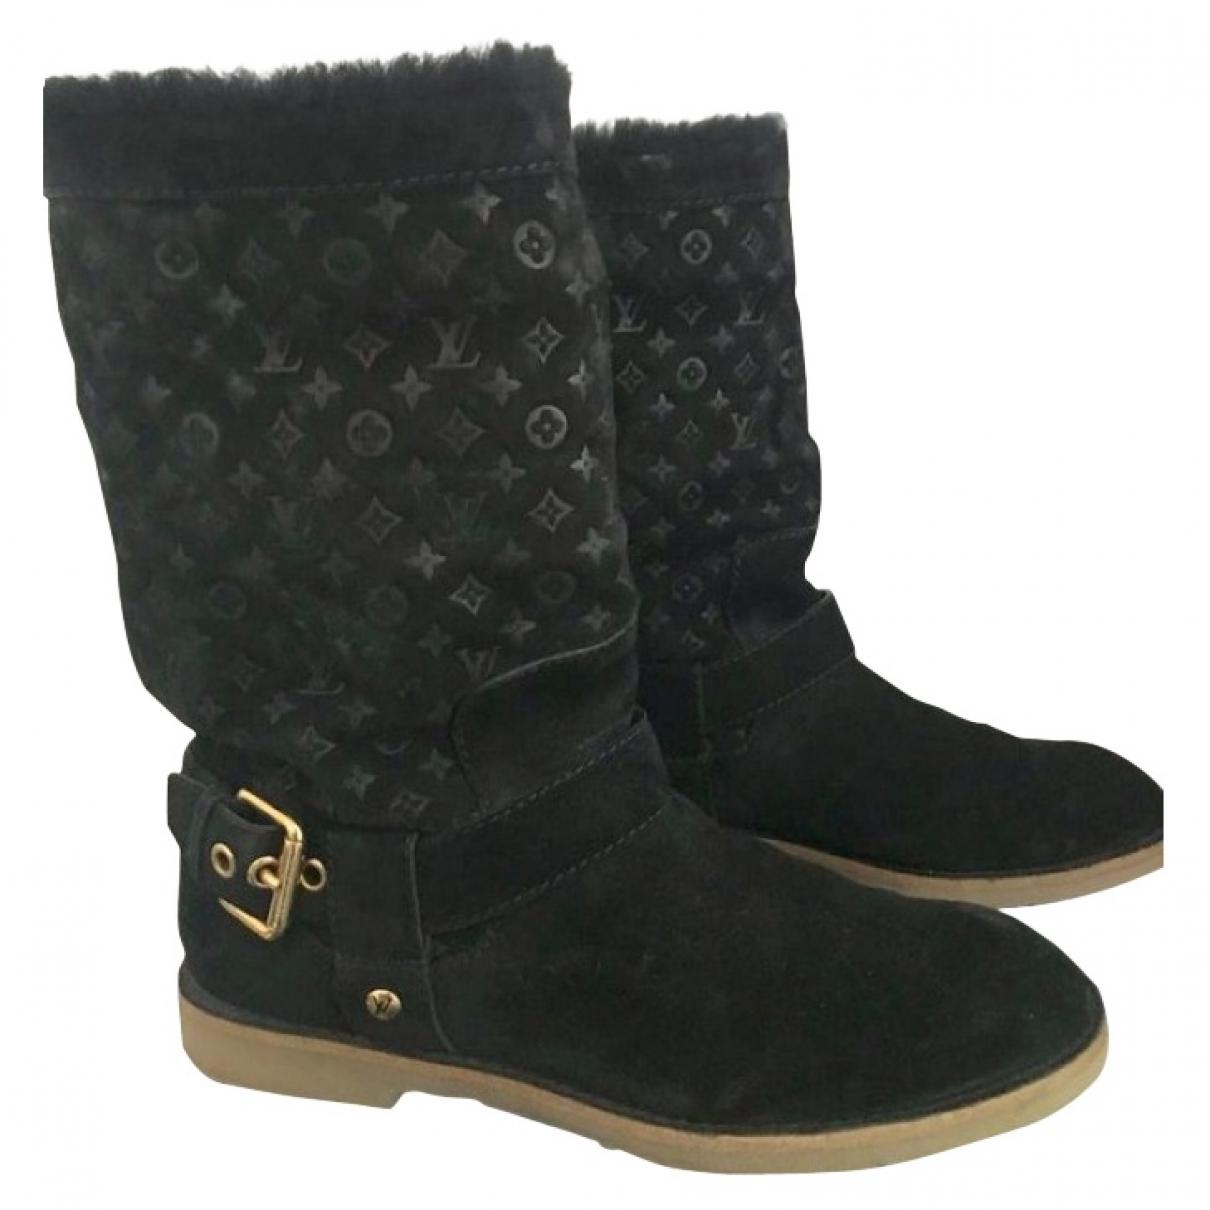 Louis Vuitton \N Black Suede Boots for Women 36 EU